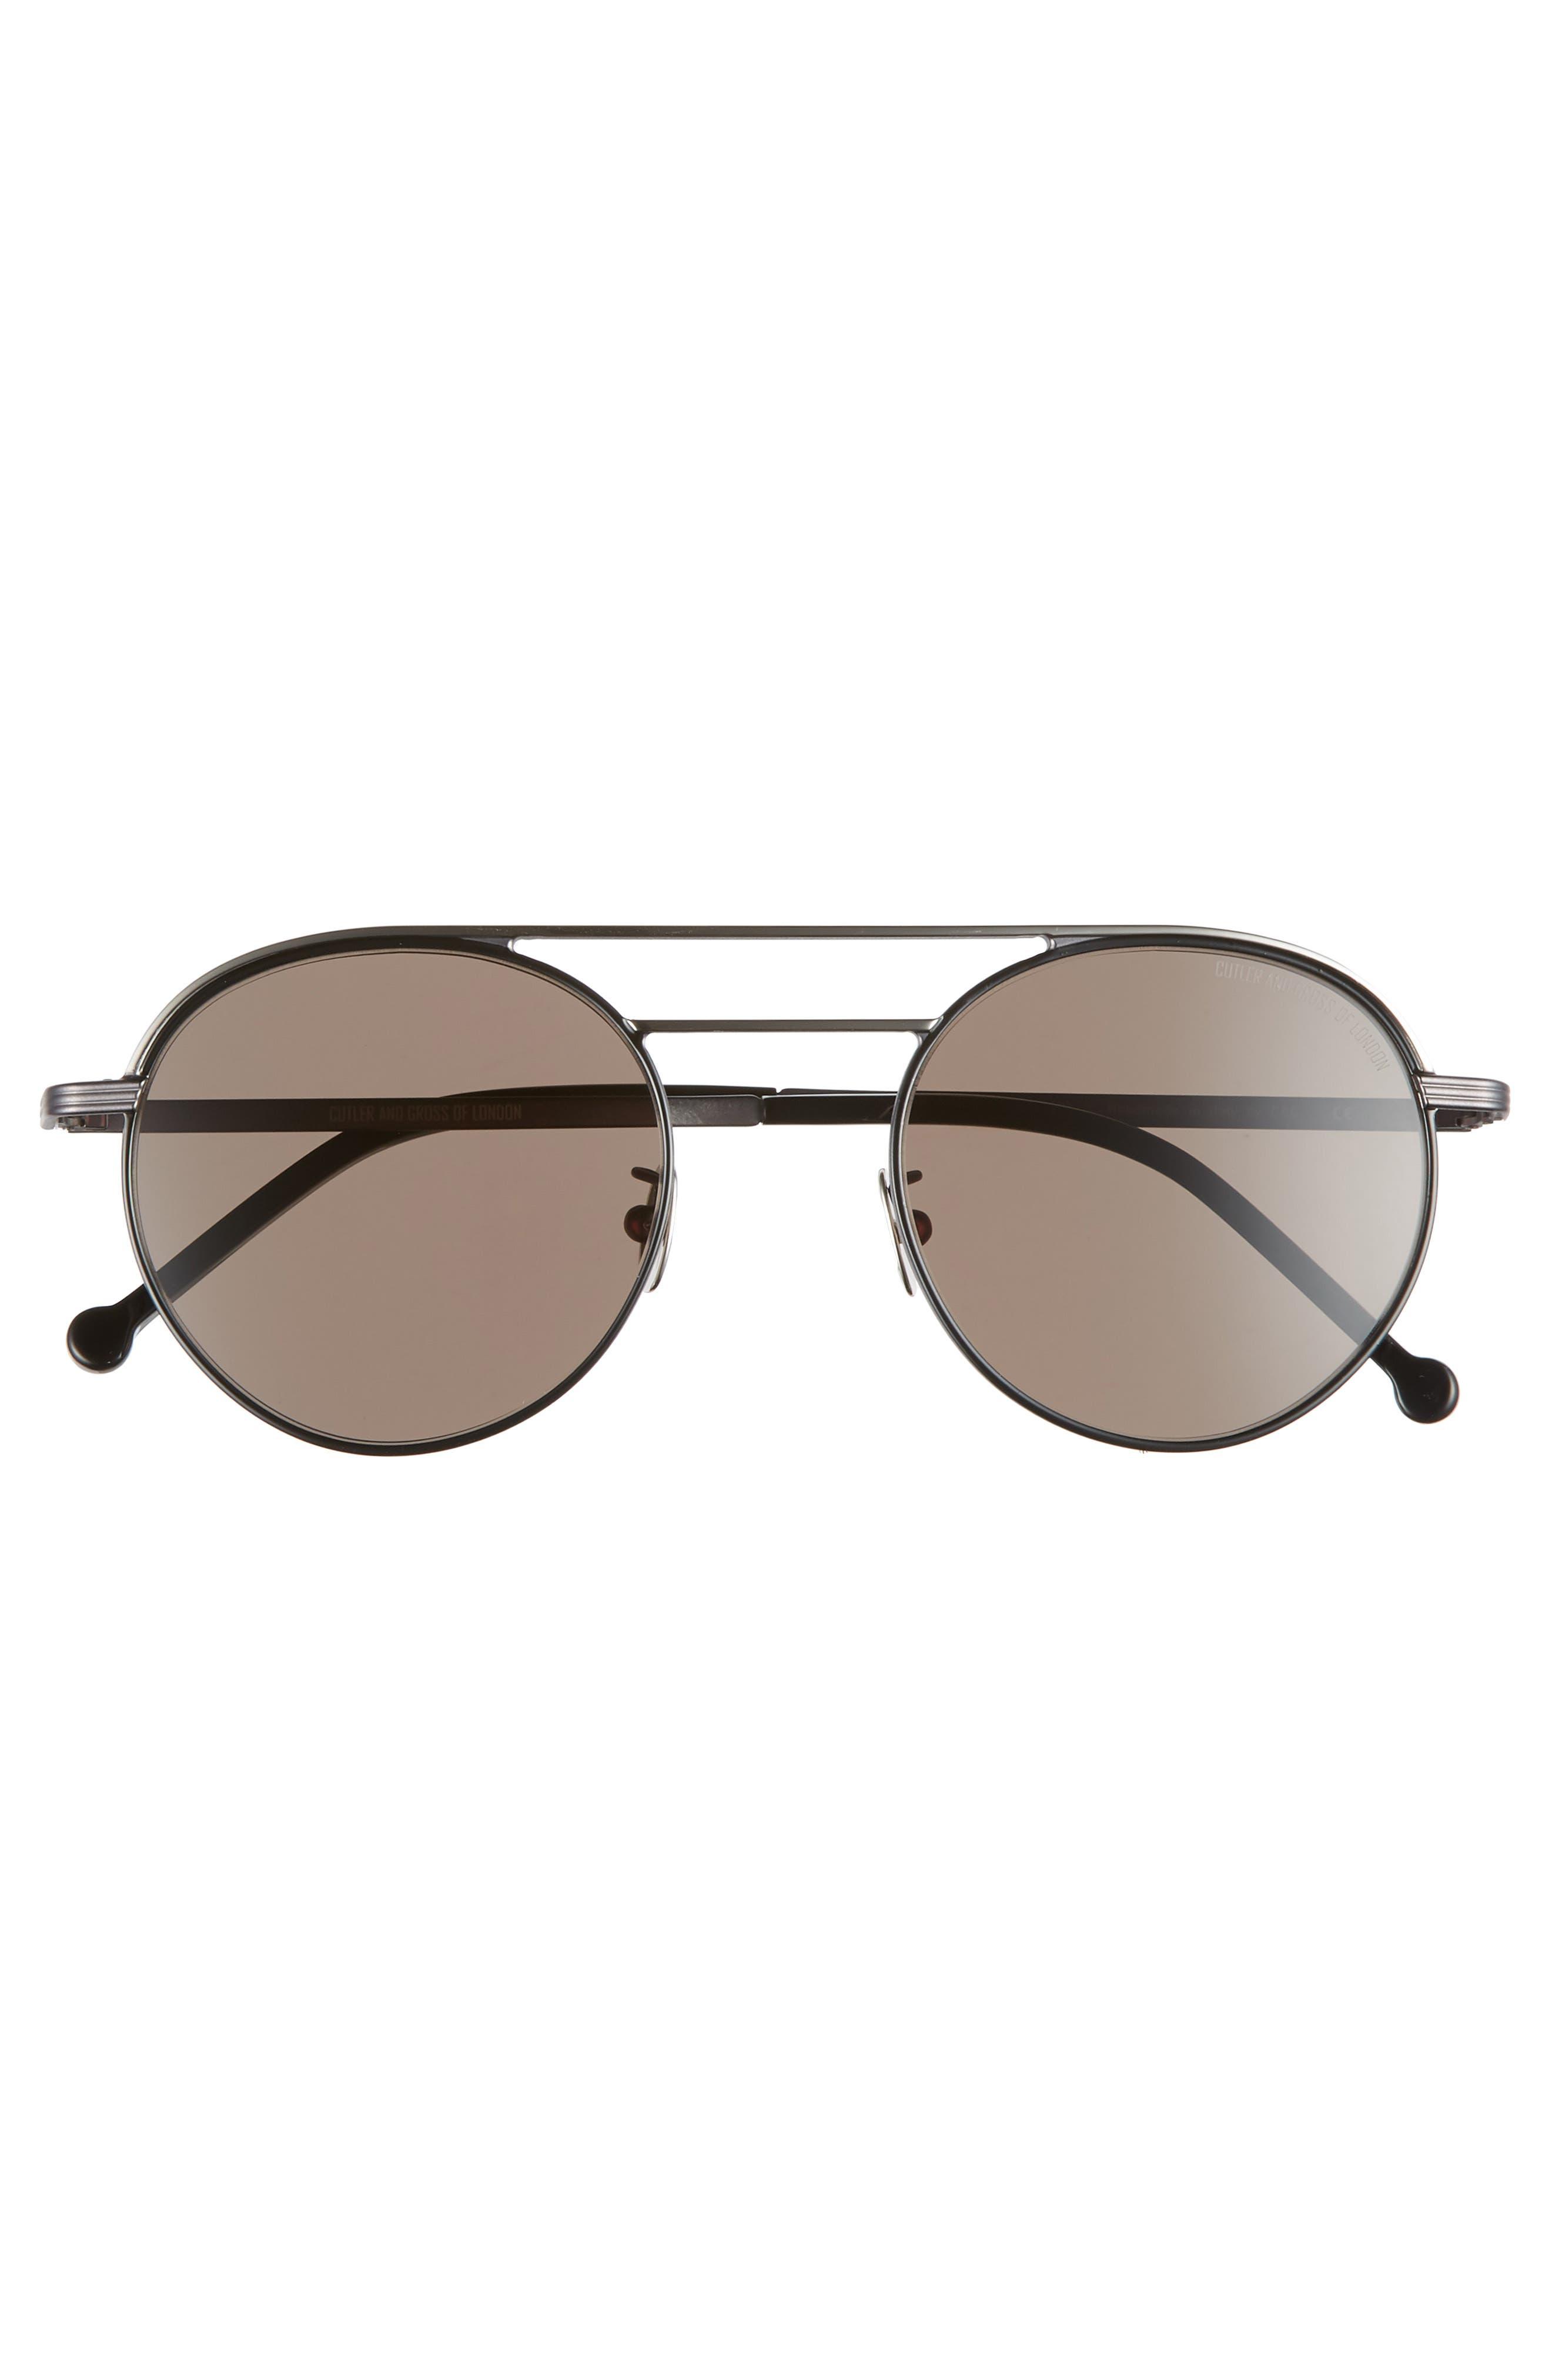 50mm Polarized Round Sunglasses,                             Alternate thumbnail 2, color,                             BLACK/ BLACK